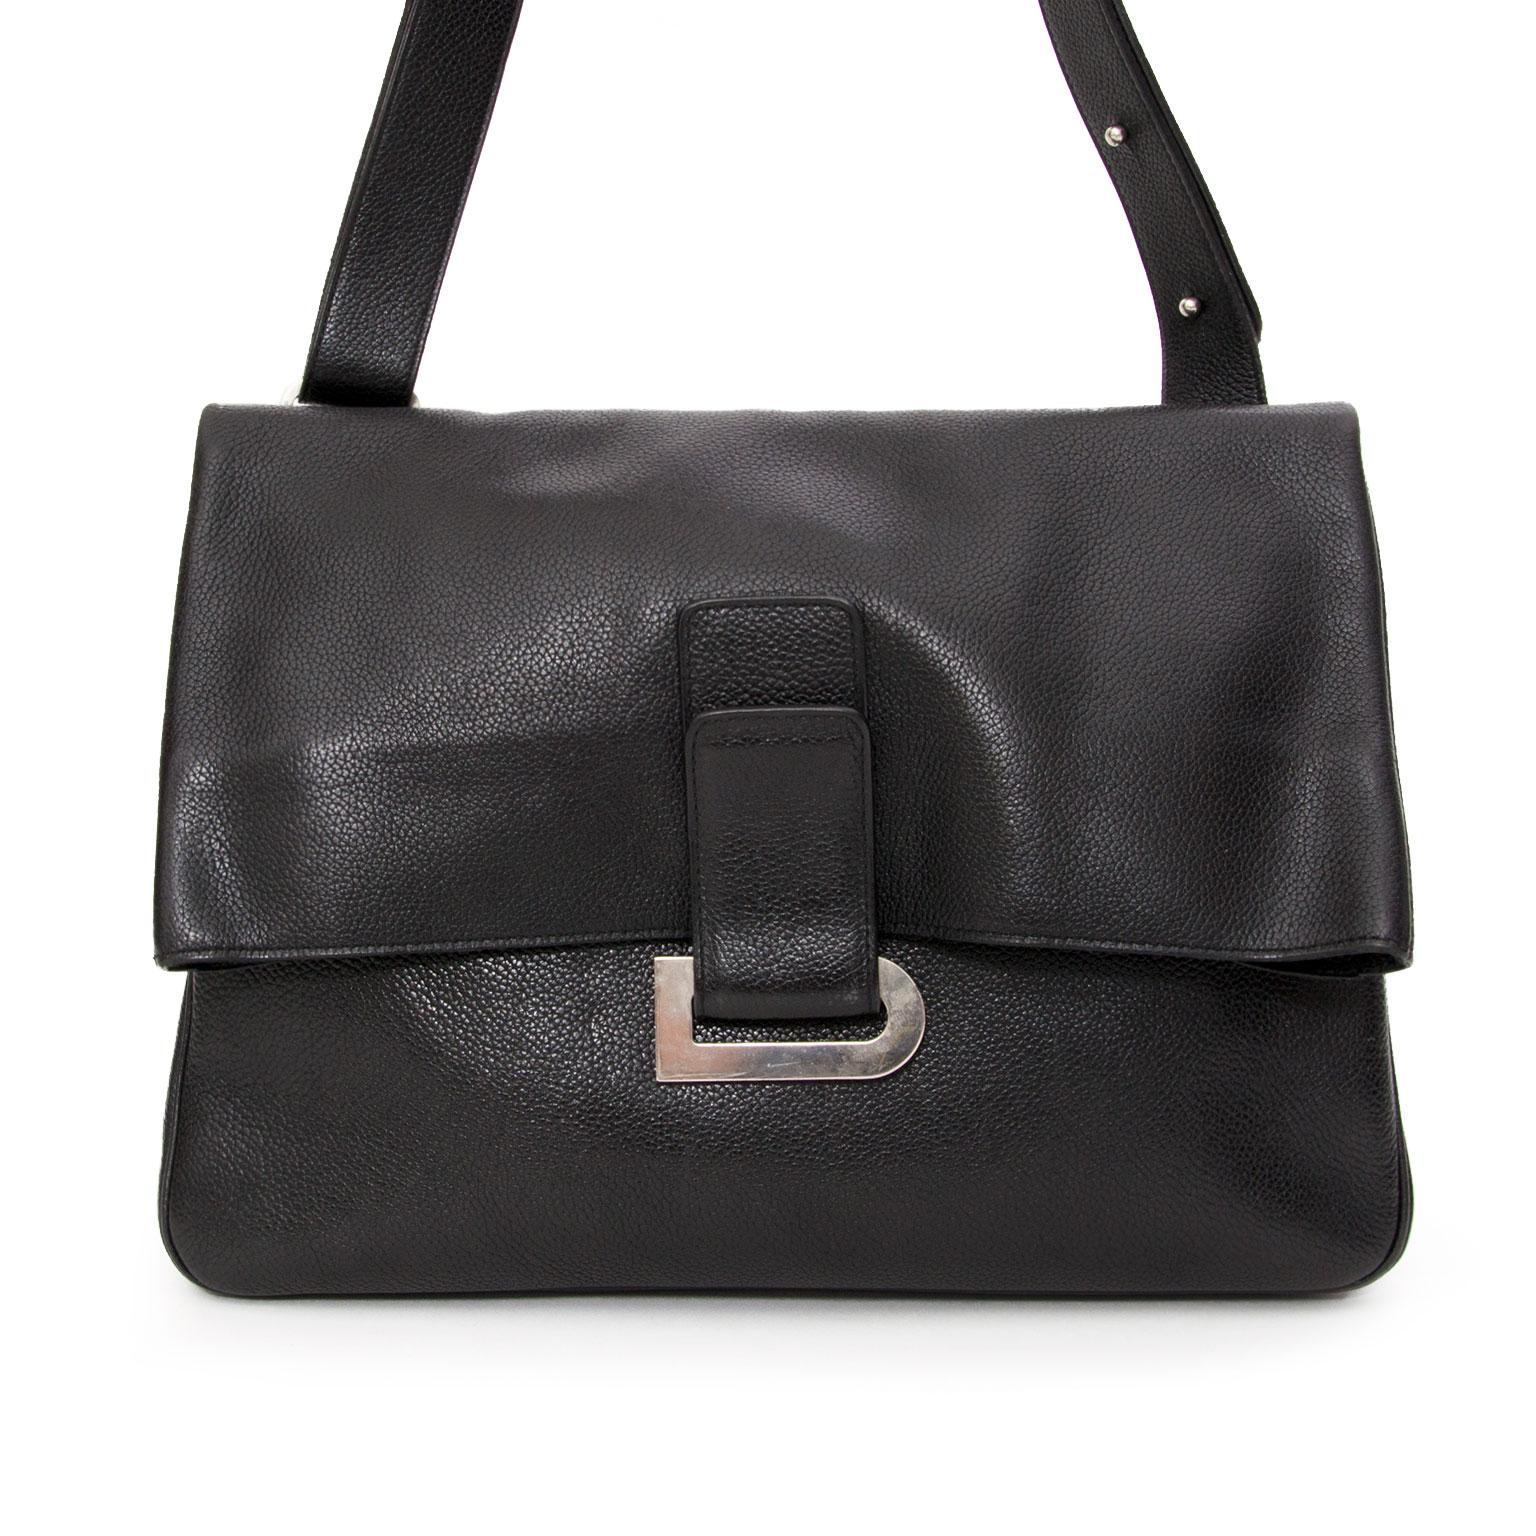 a1f1fe147319 ... buy safe online second hand designer seconde main Delvaux Gm Black  Passerelle (